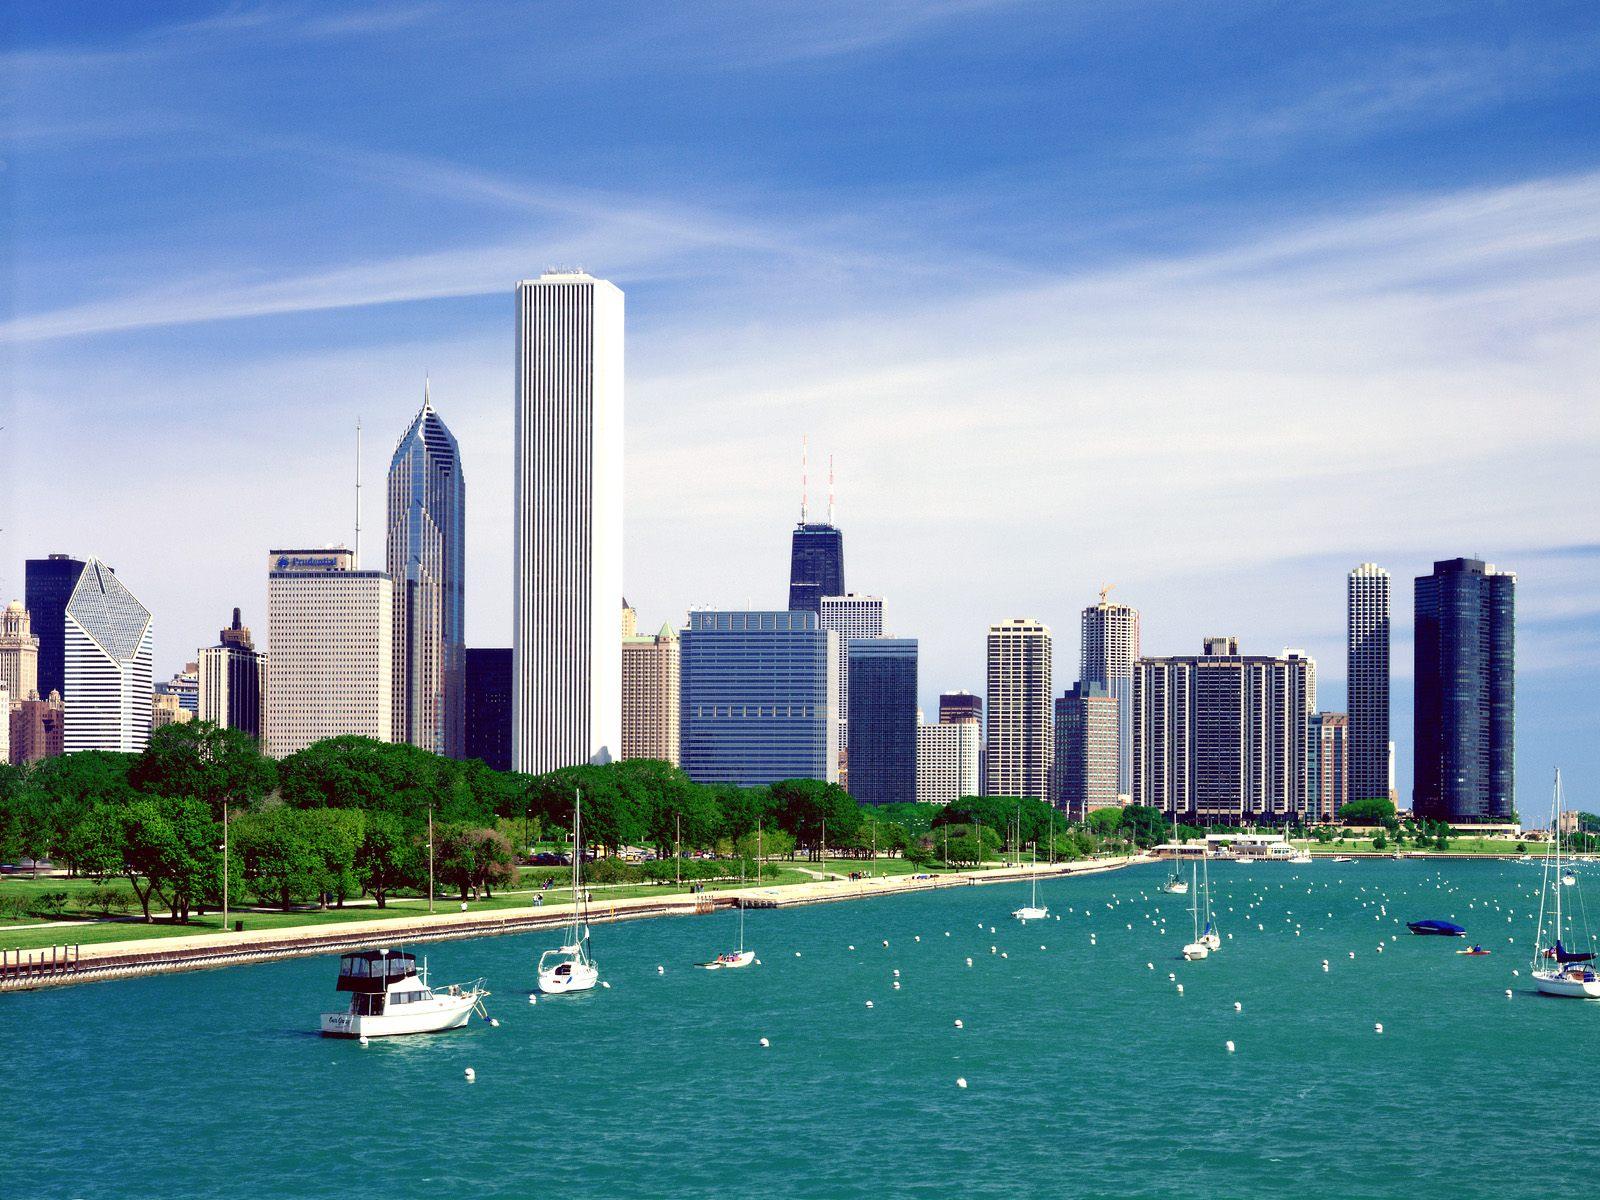 http://4.bp.blogspot.com/-ke2R_MEMnxM/TefK7ciRU2I/AAAAAAAAAkk/l2RqjG4j8Fs/s1600/Lake+Michigan+and+the+Chicago+Skyline%252C+Illinois.jpg